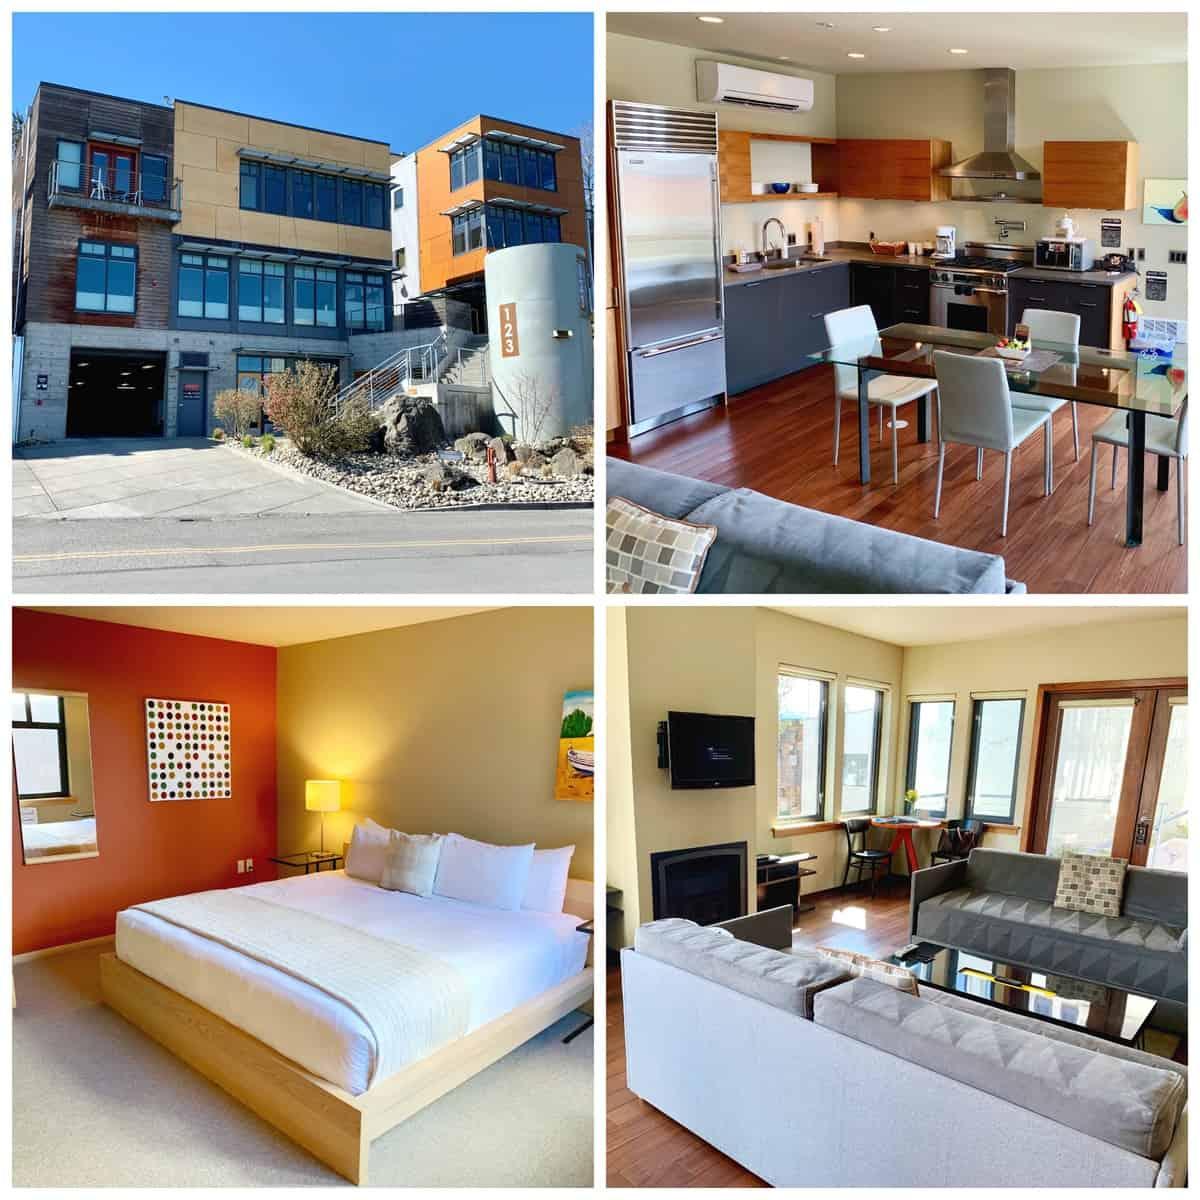 Penthouse 7 - Island Inn- Friday Harbor - San Juan Island